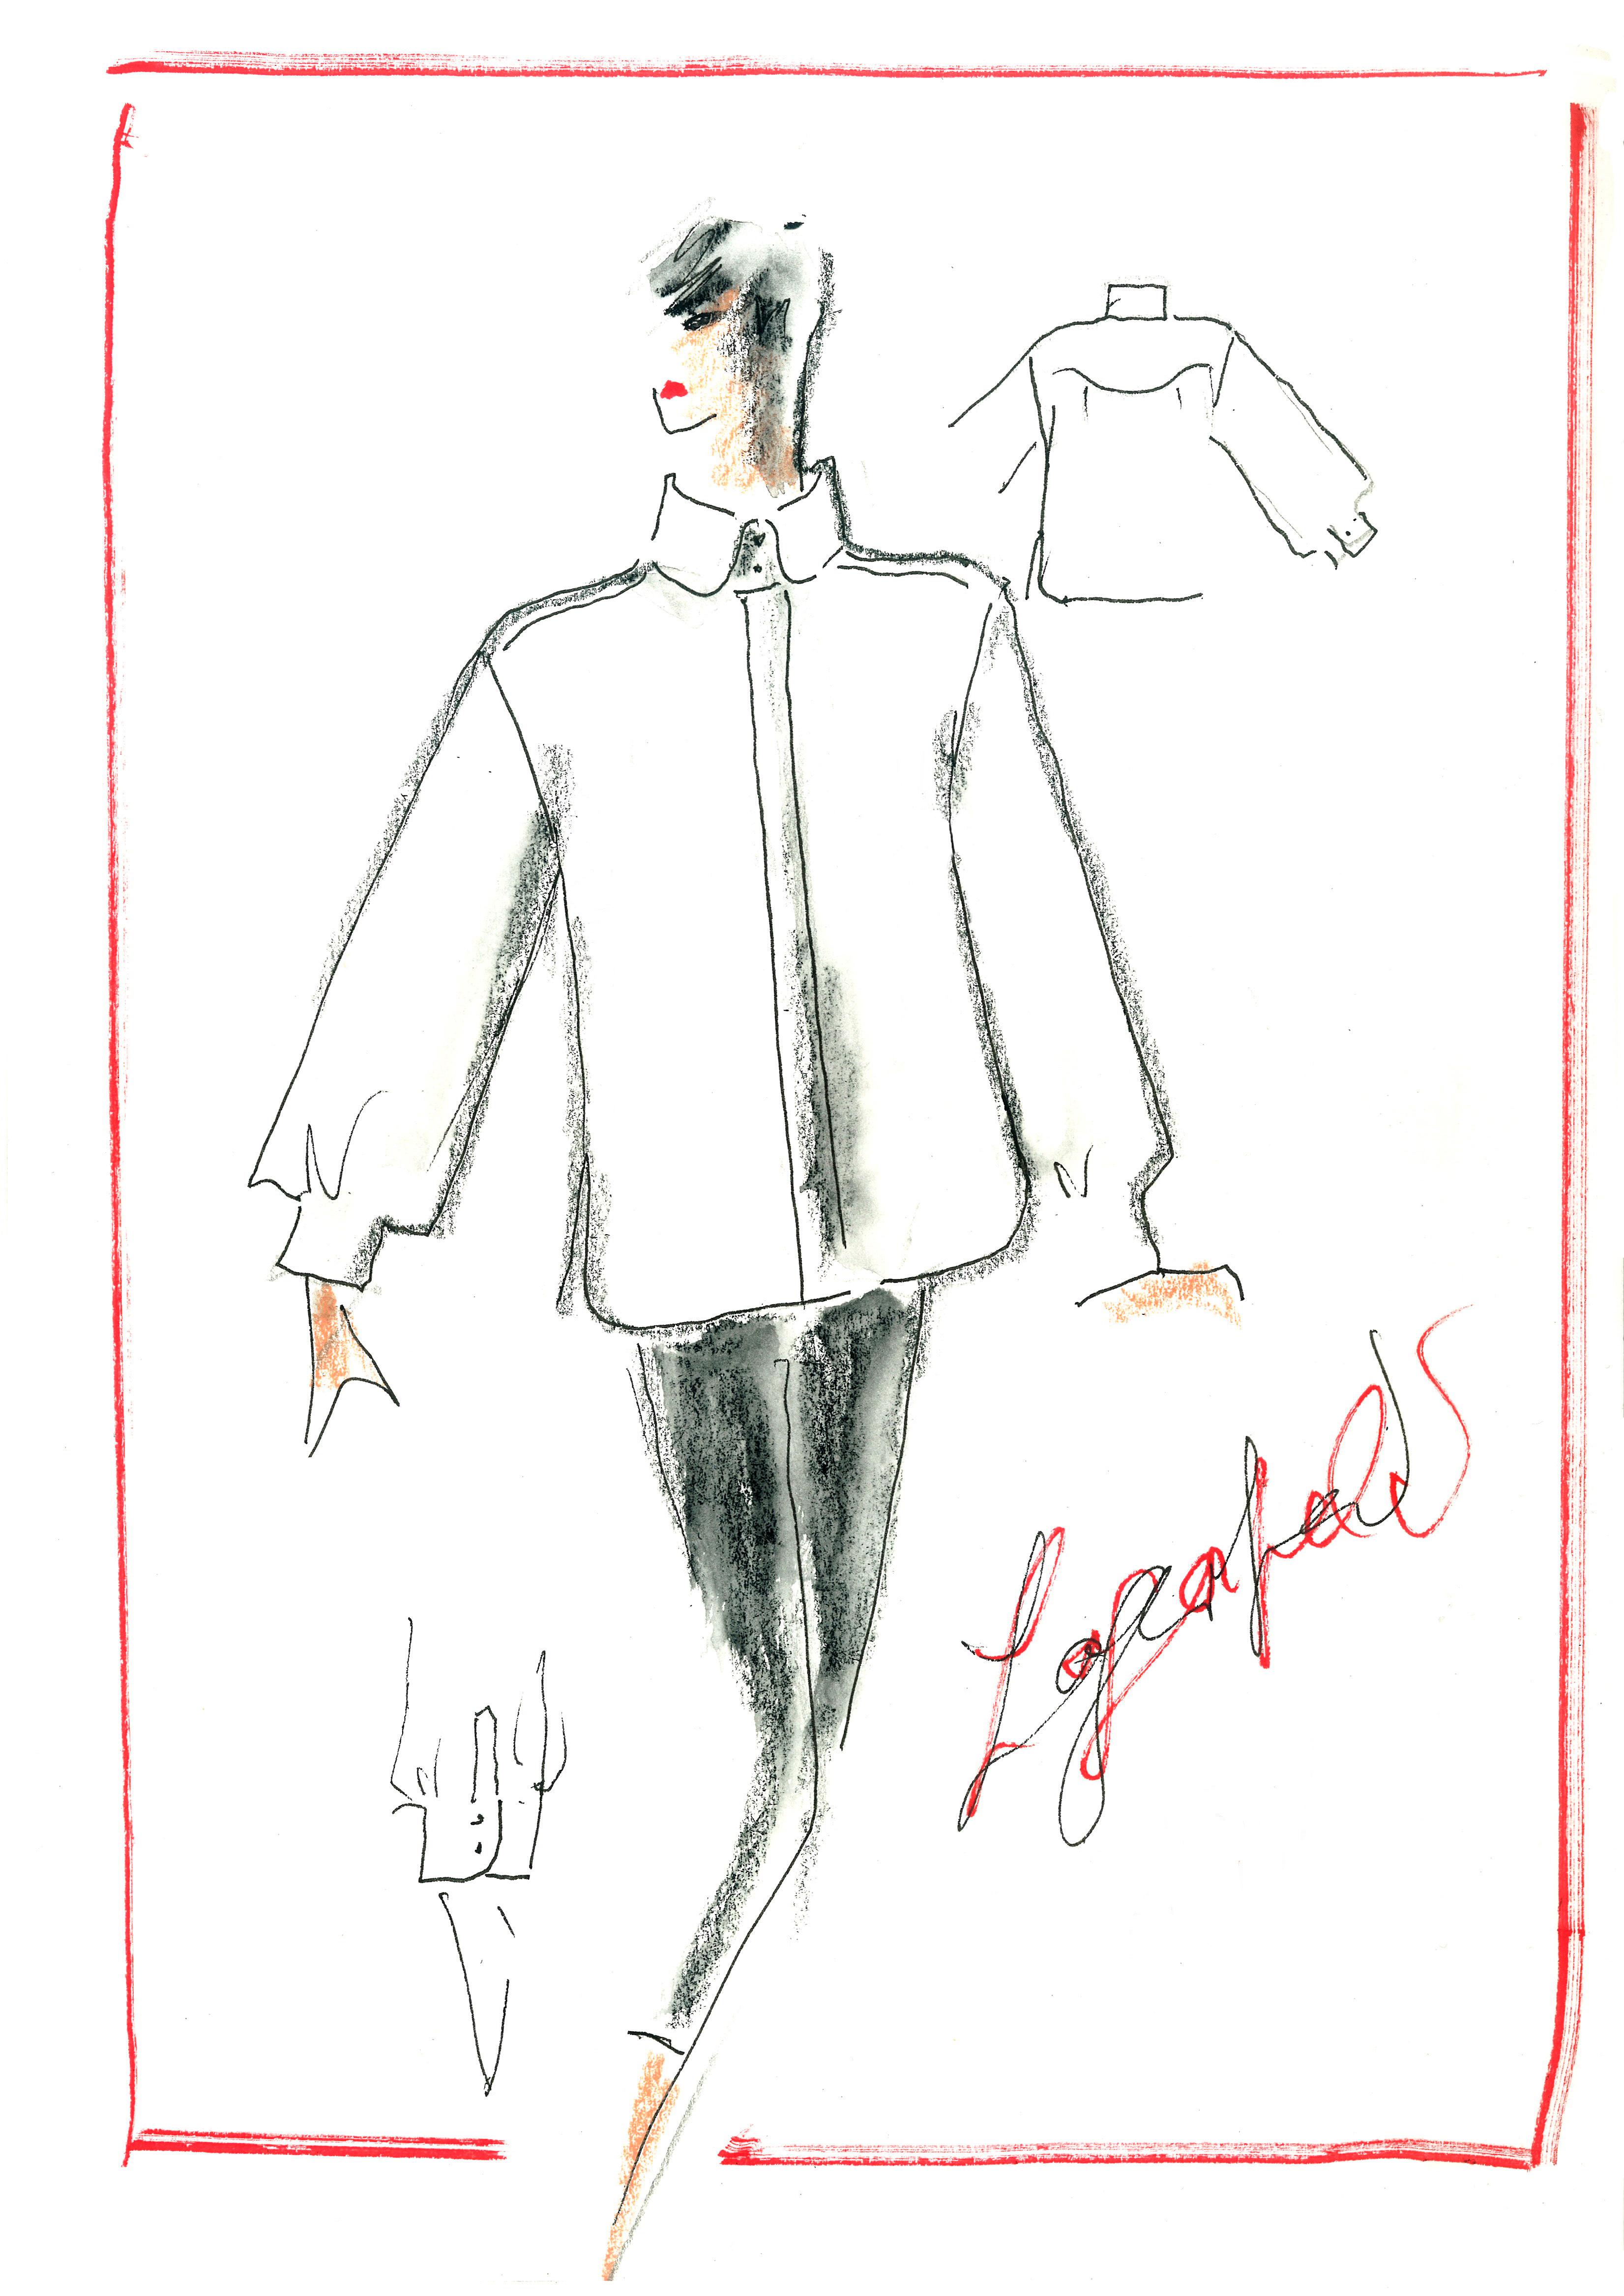 The White Shirt sketch KL